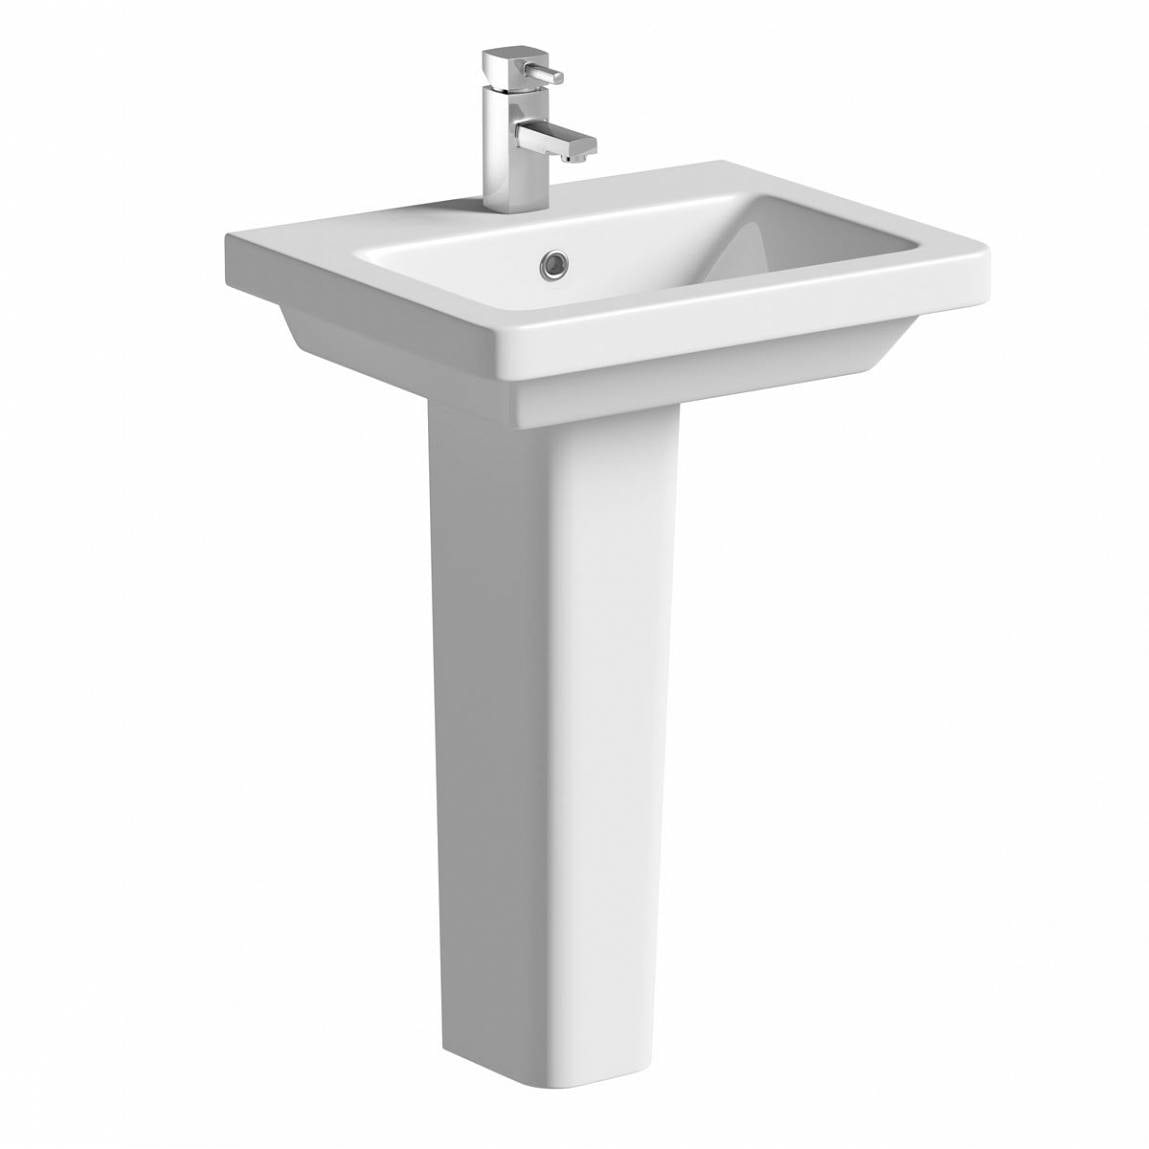 Verso 1TH 550mm Basin & Pedestal